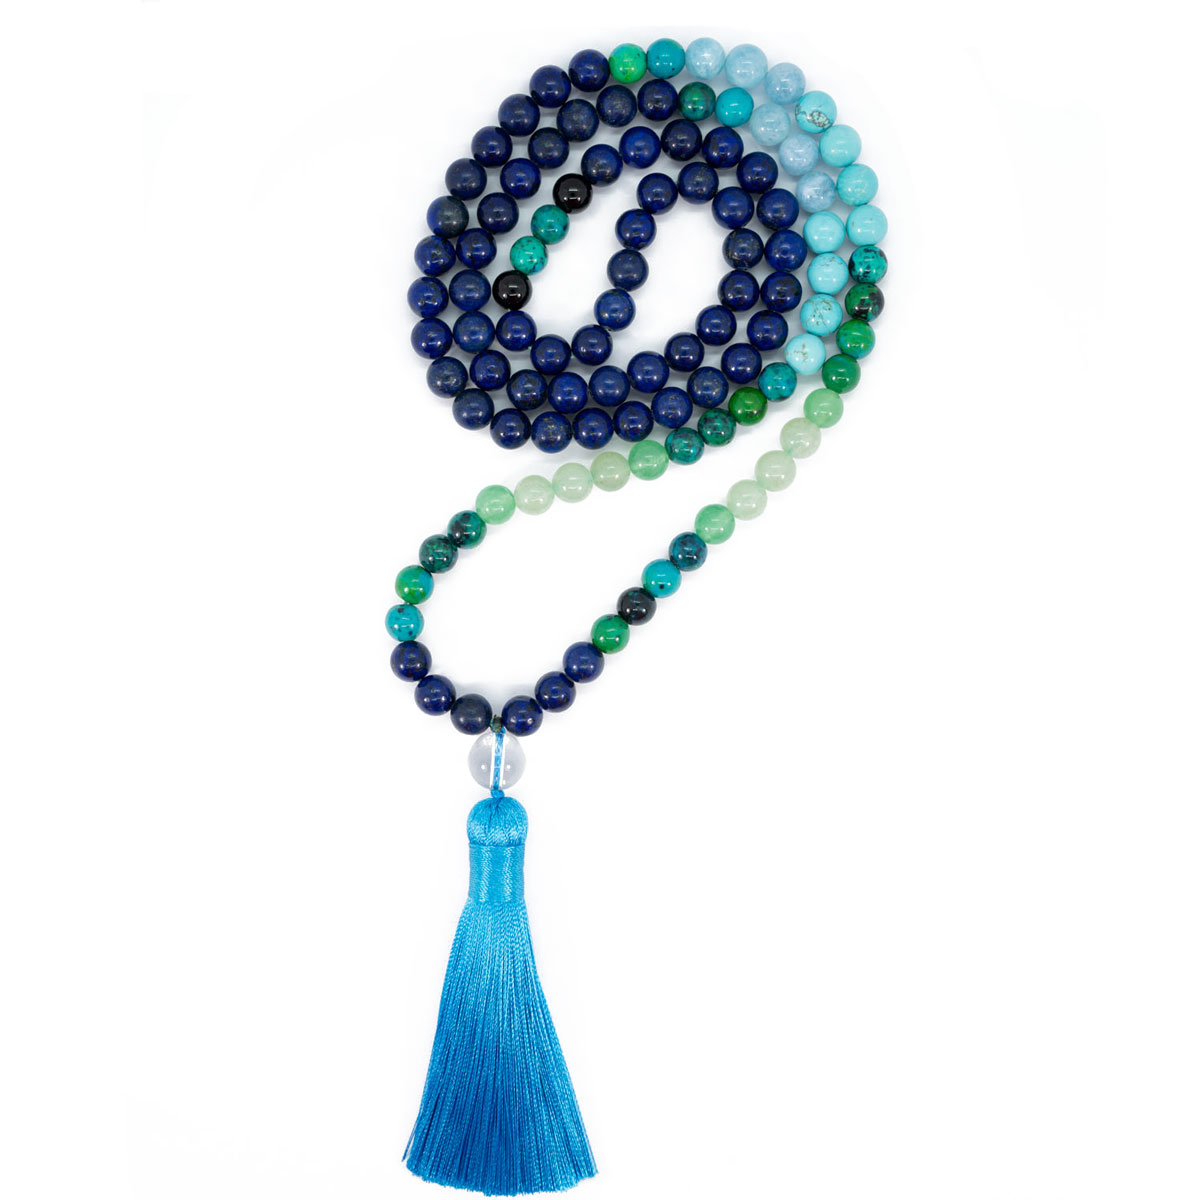 Sri Avinash Blessed™ Lapis Lazuli, Aventurine & Chrysocolla Mala Necklace